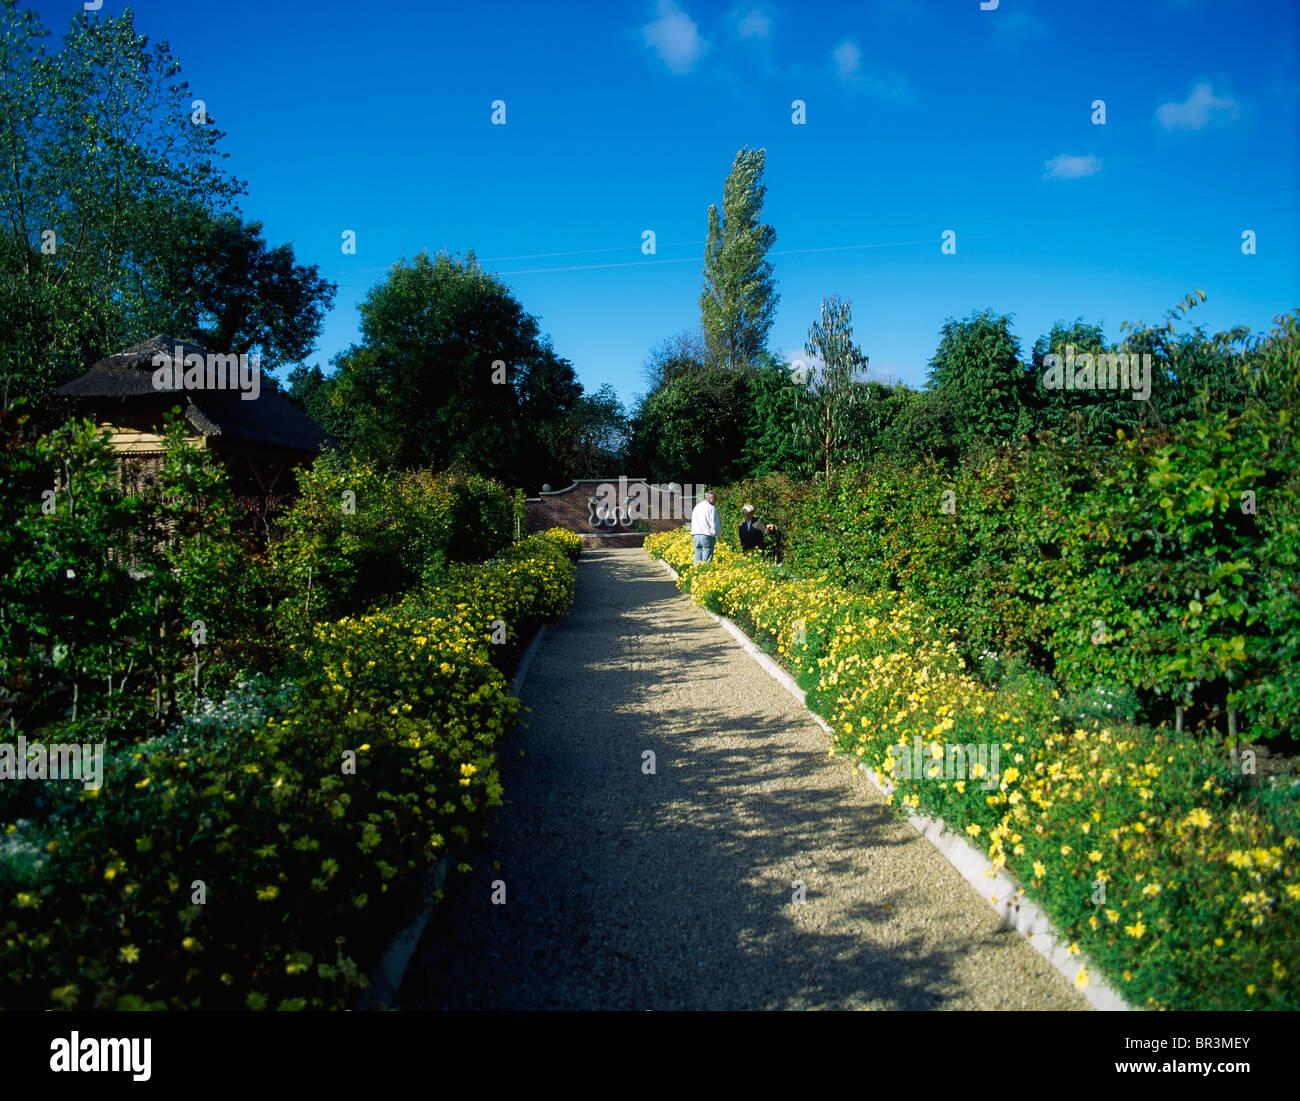 National Garden Exhibition Centre | Kilquade | UPDATED